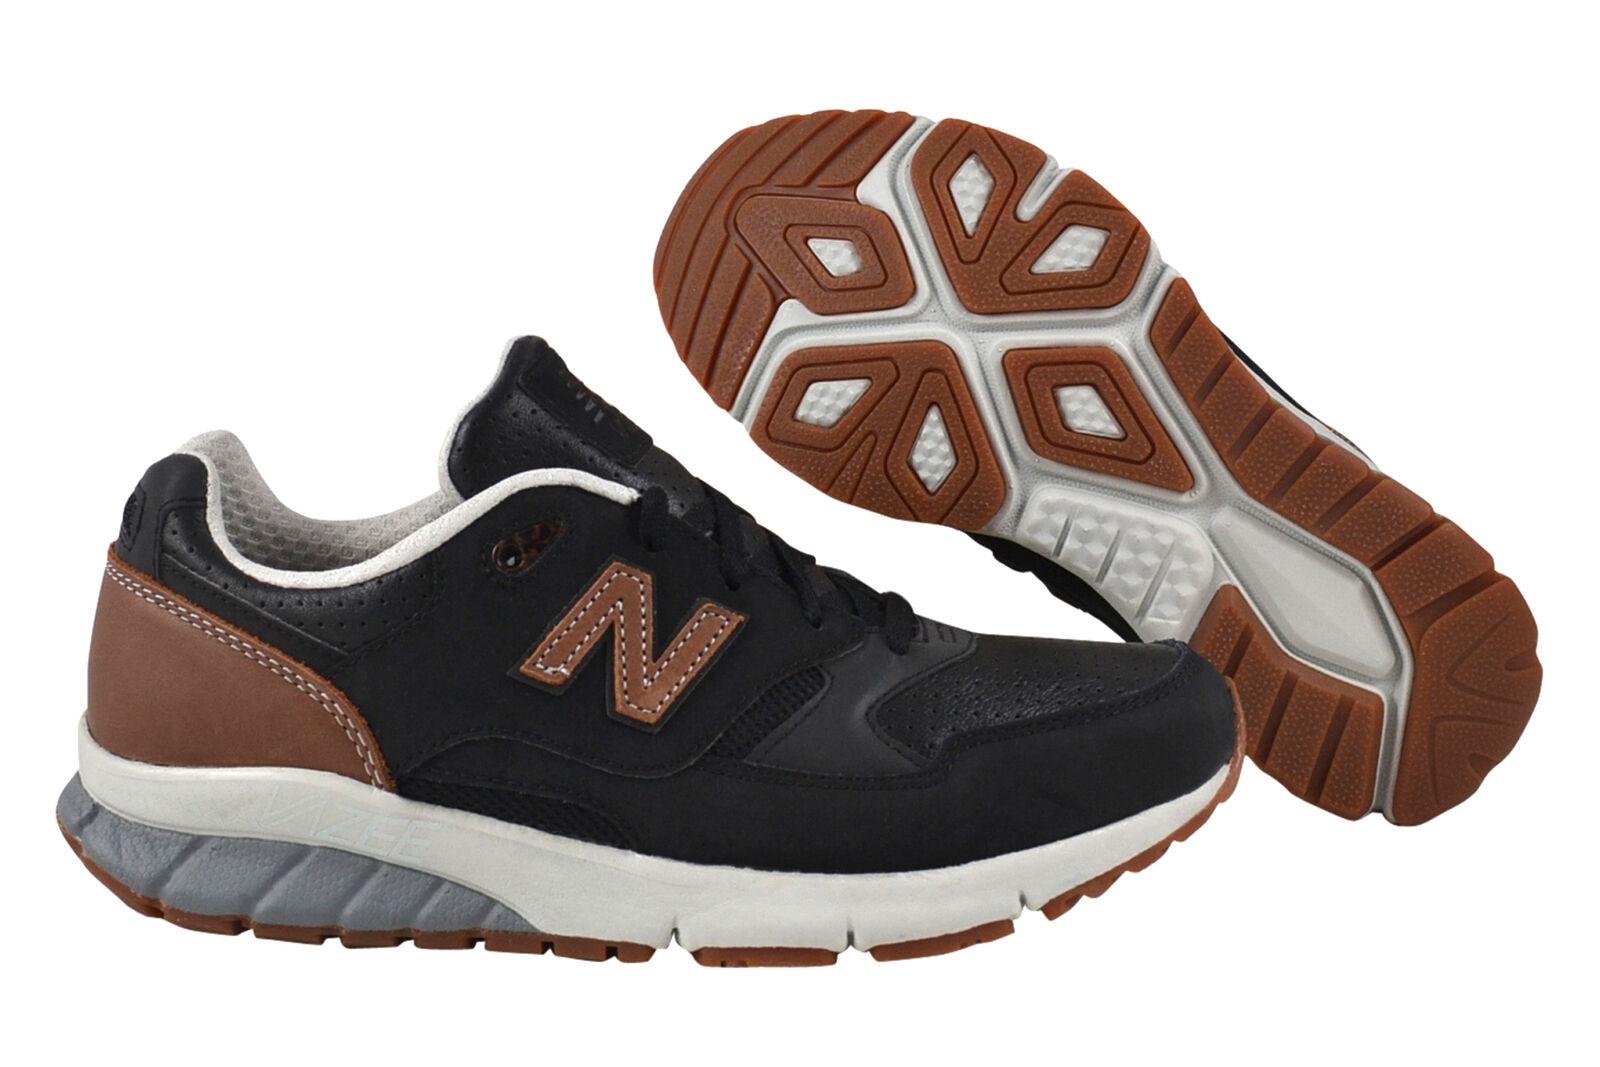 New Balance MVL530 RB black Schuhe/Sneaker schwarz